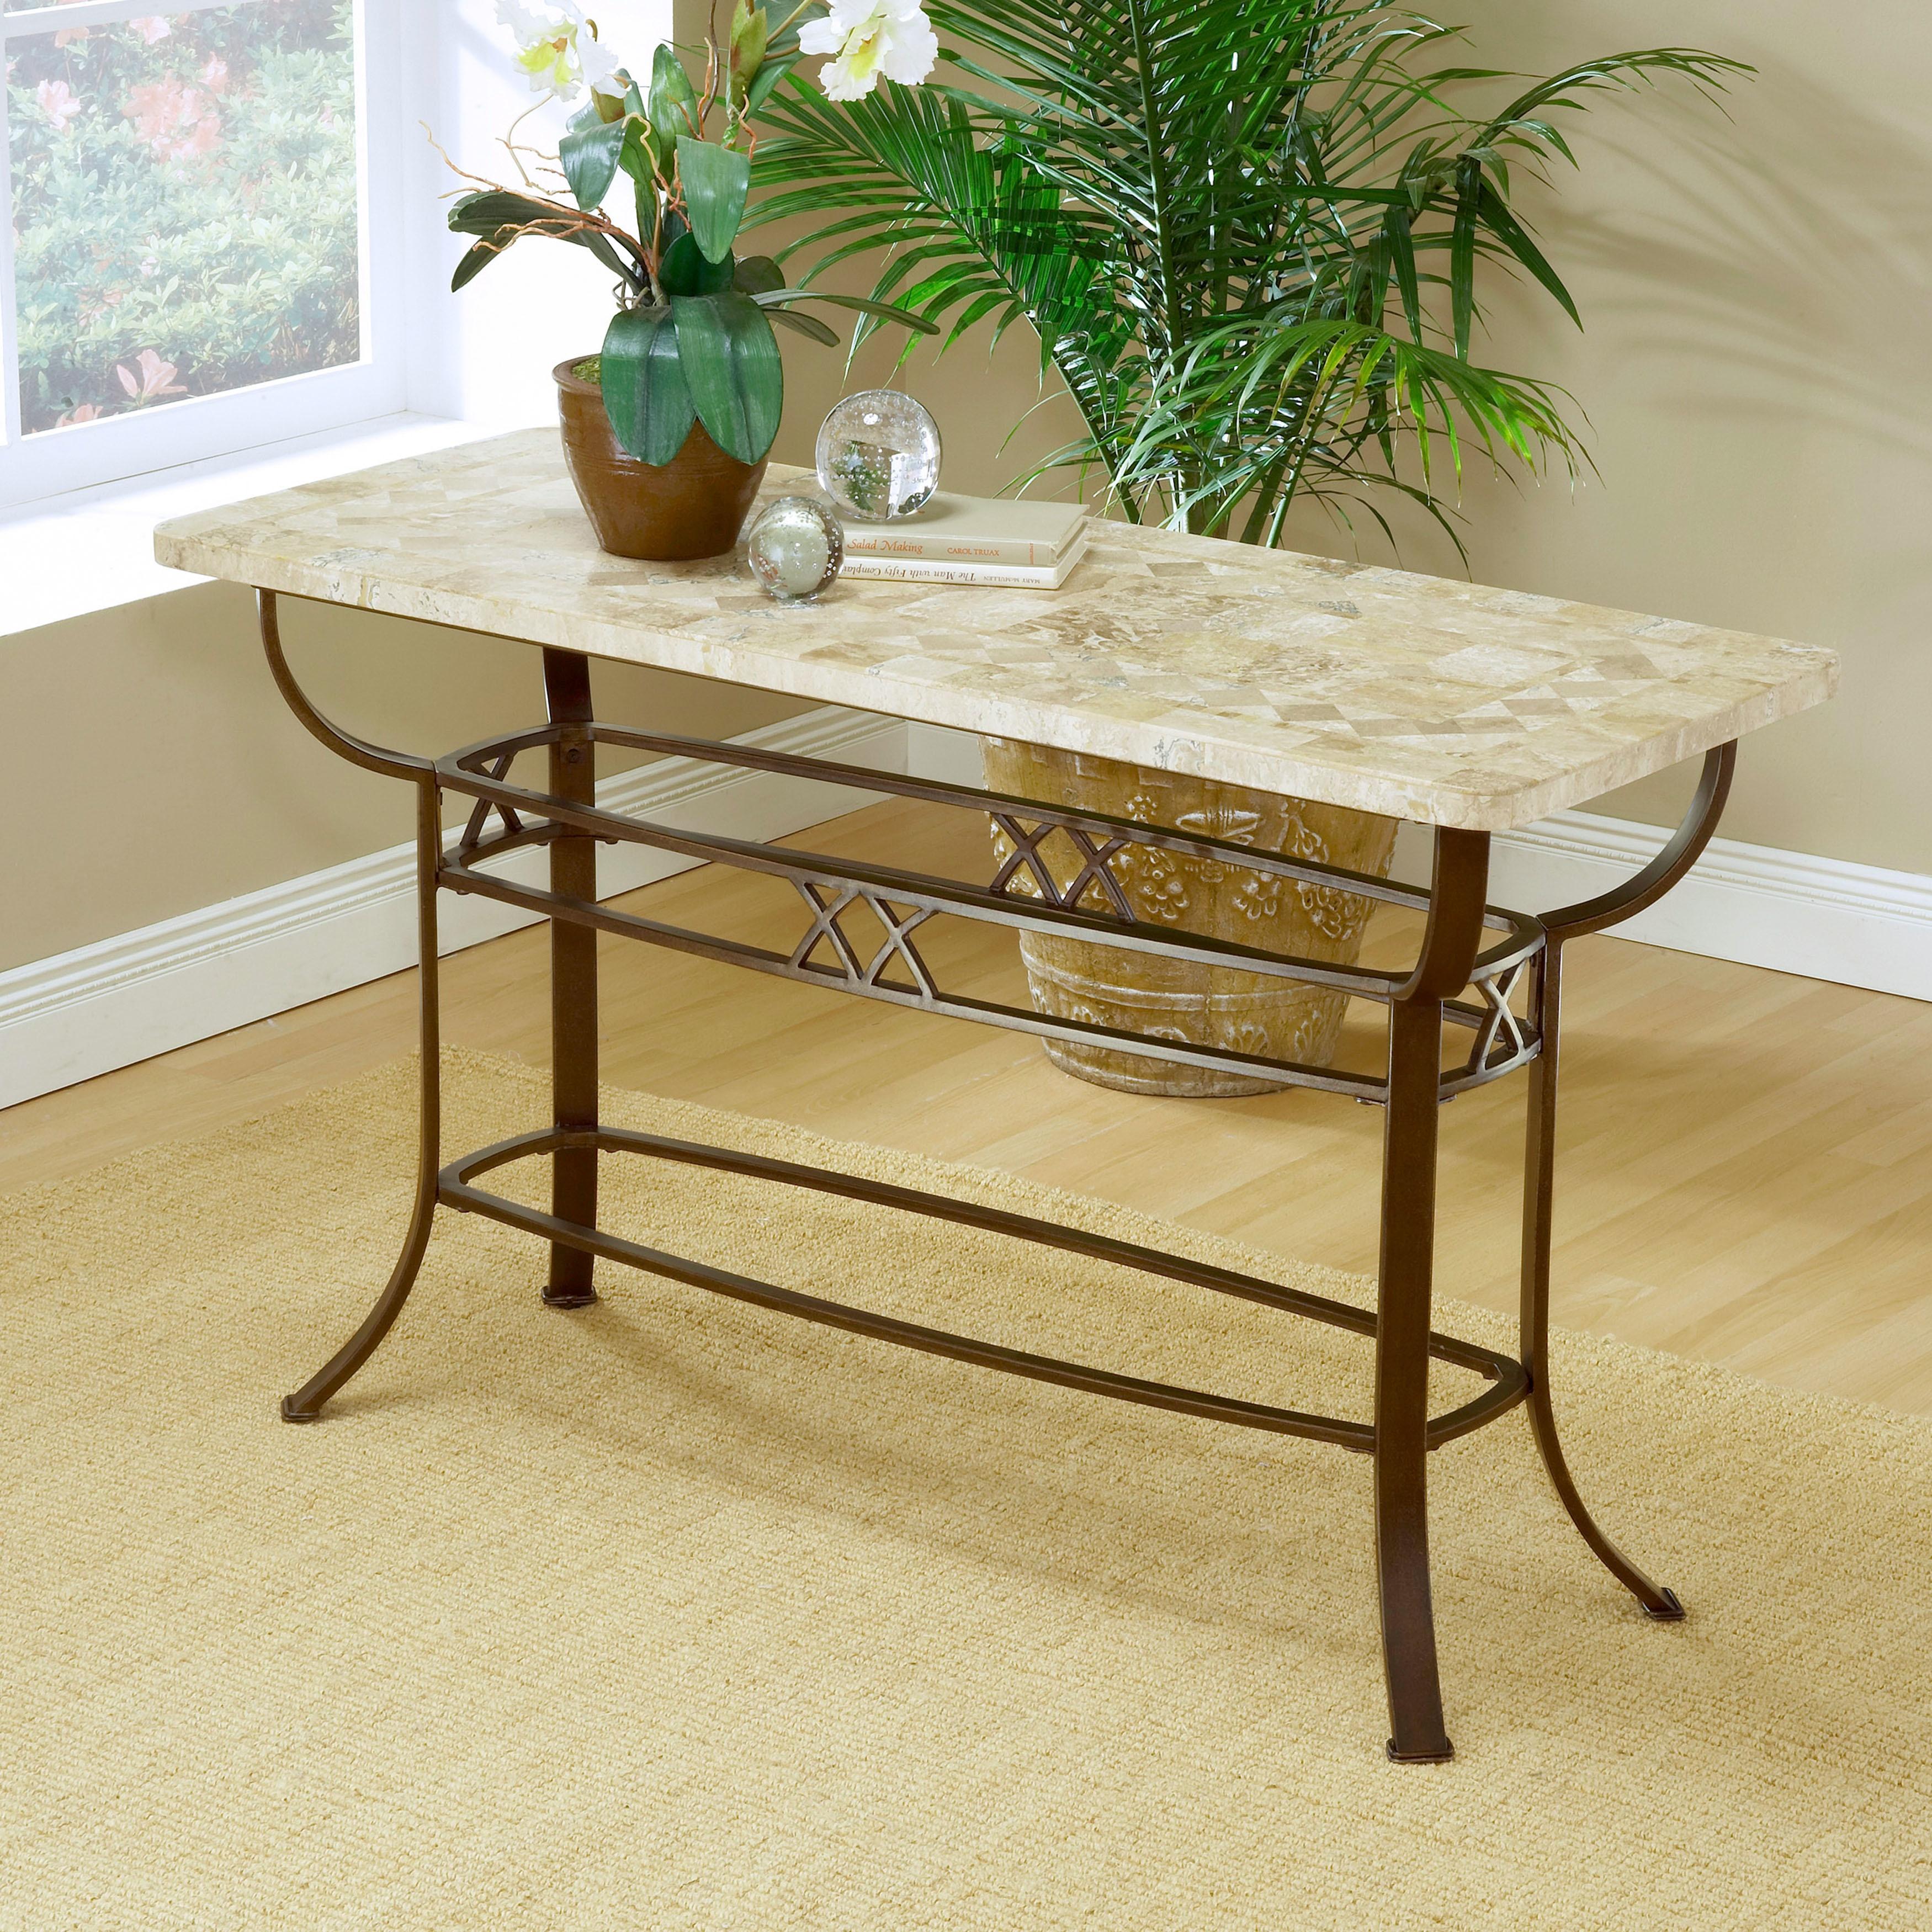 Awe Inspiring Hillsdale Furniture Brookside Fossil Brown Natural Stone Metal Sofa Table Spiritservingveterans Wood Chair Design Ideas Spiritservingveteransorg